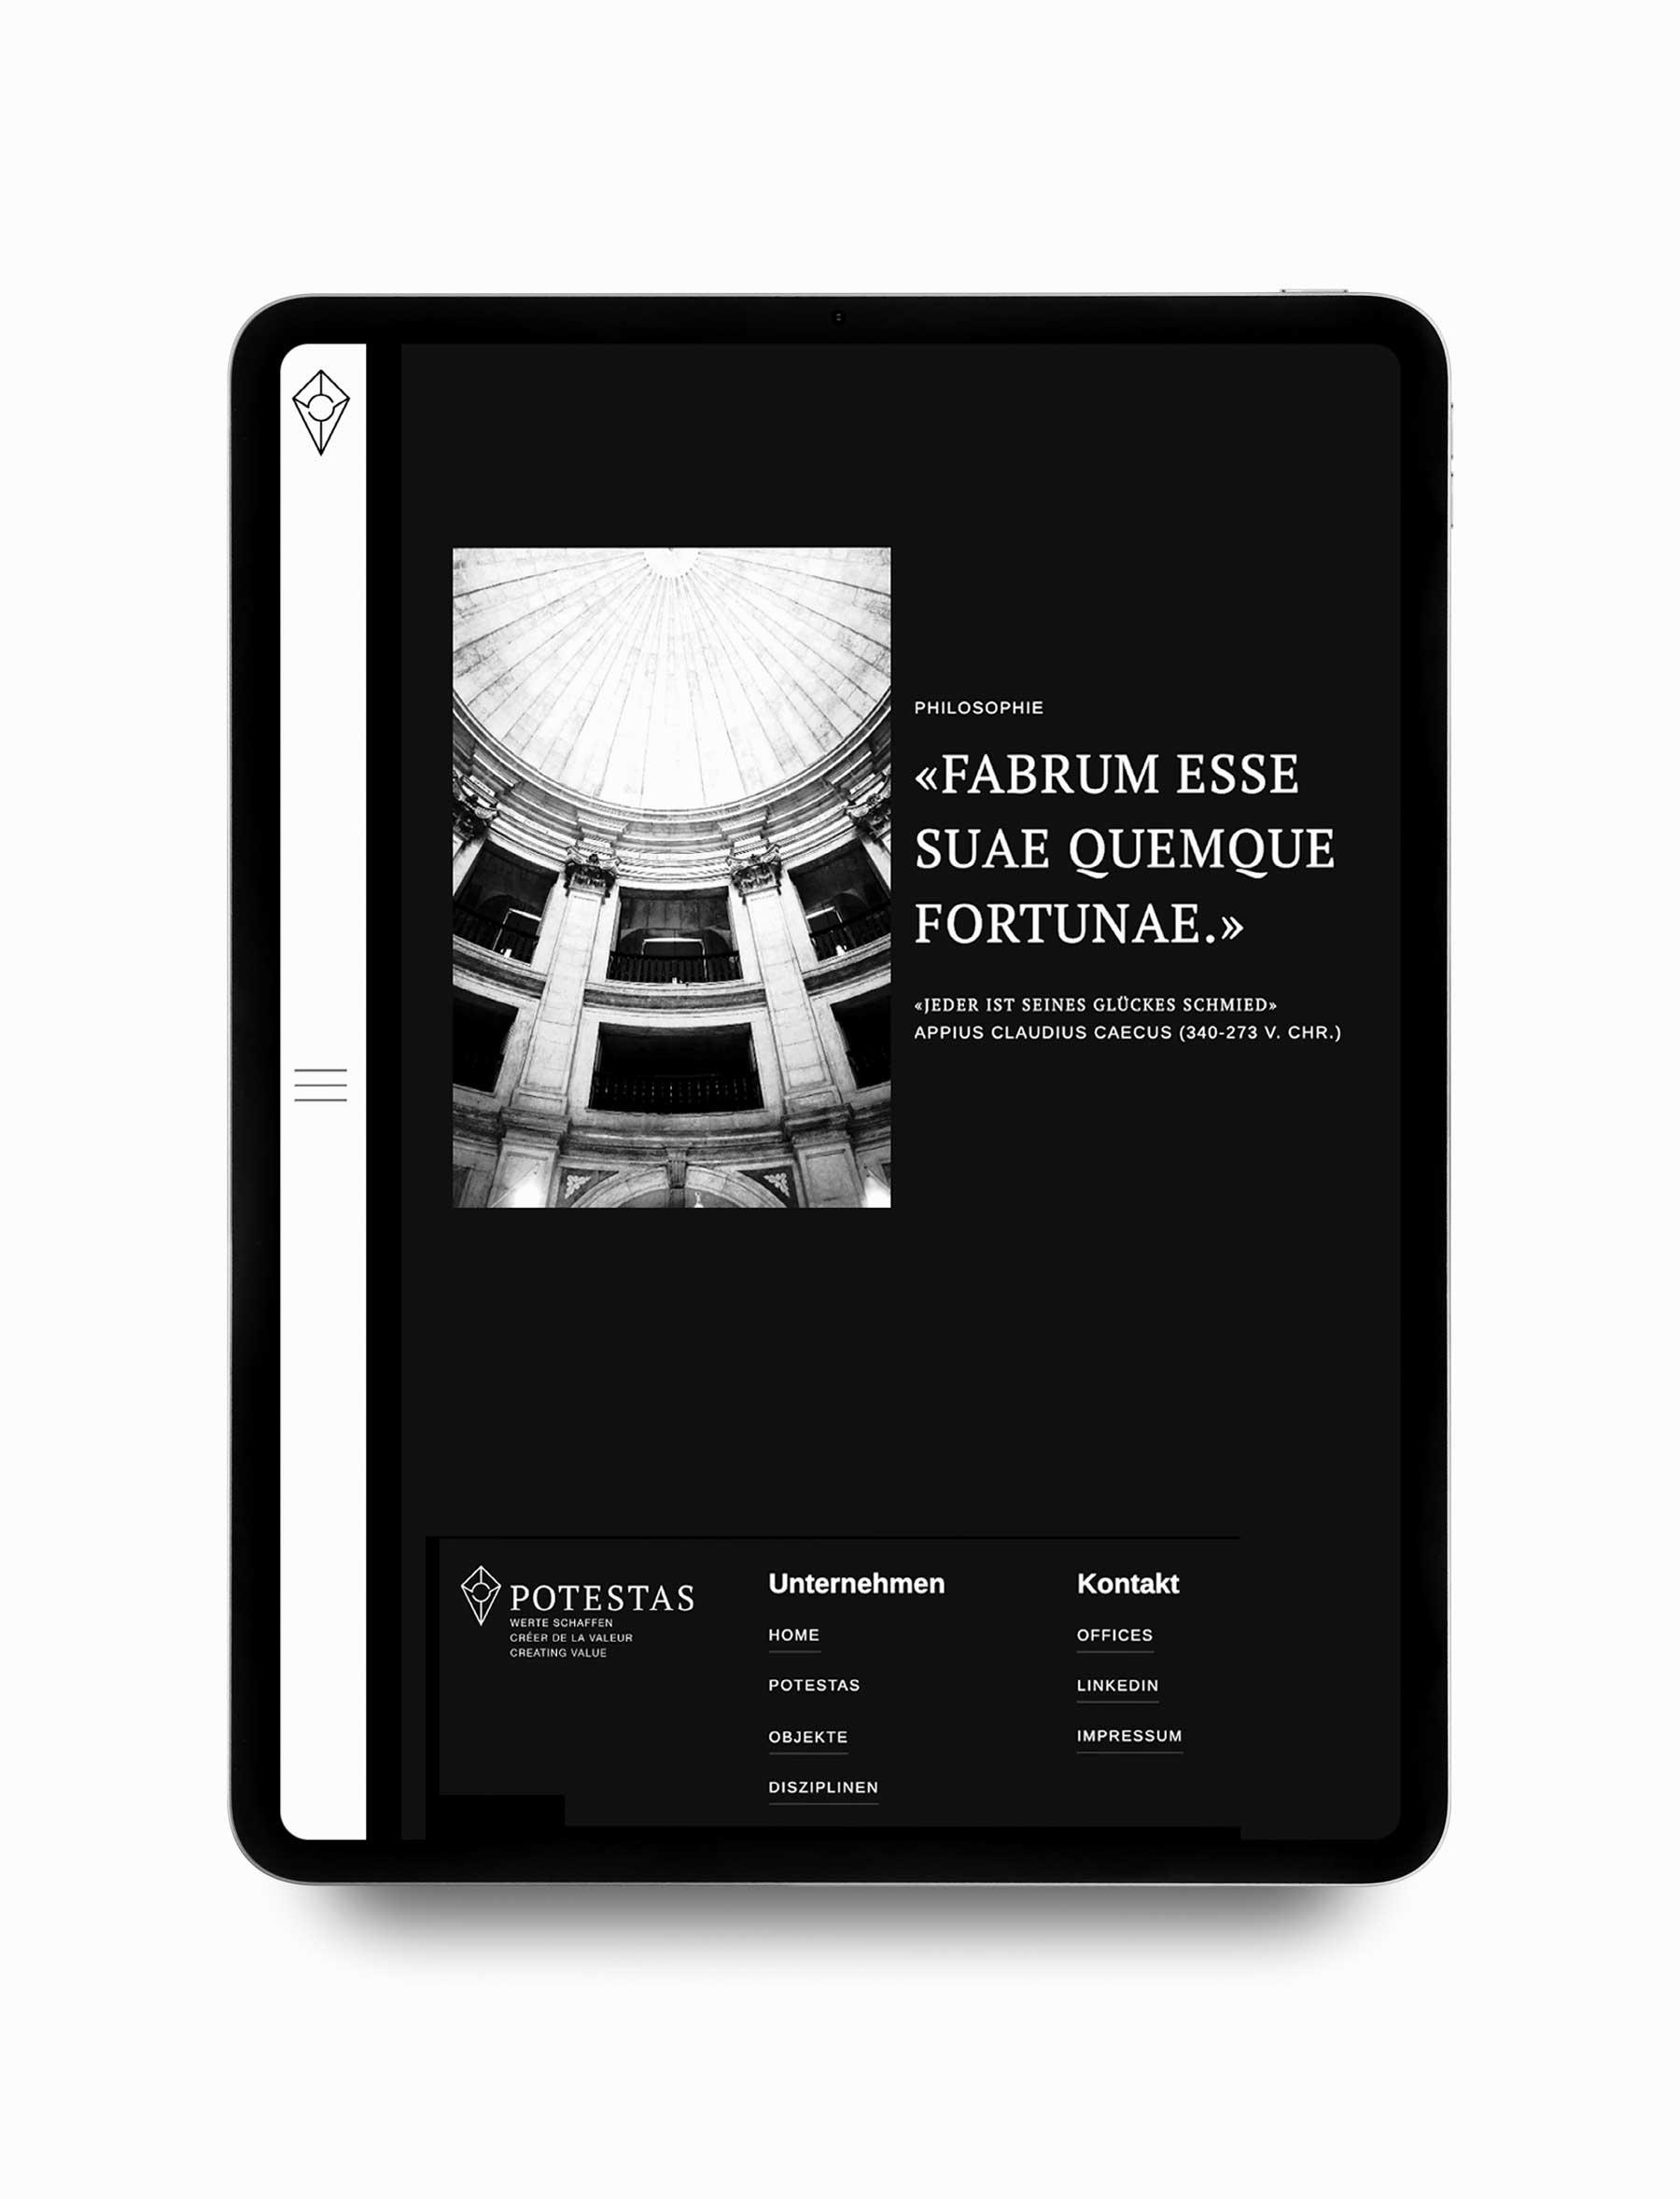 Webseite Design Landing Page Immobilien Firma Schweiz